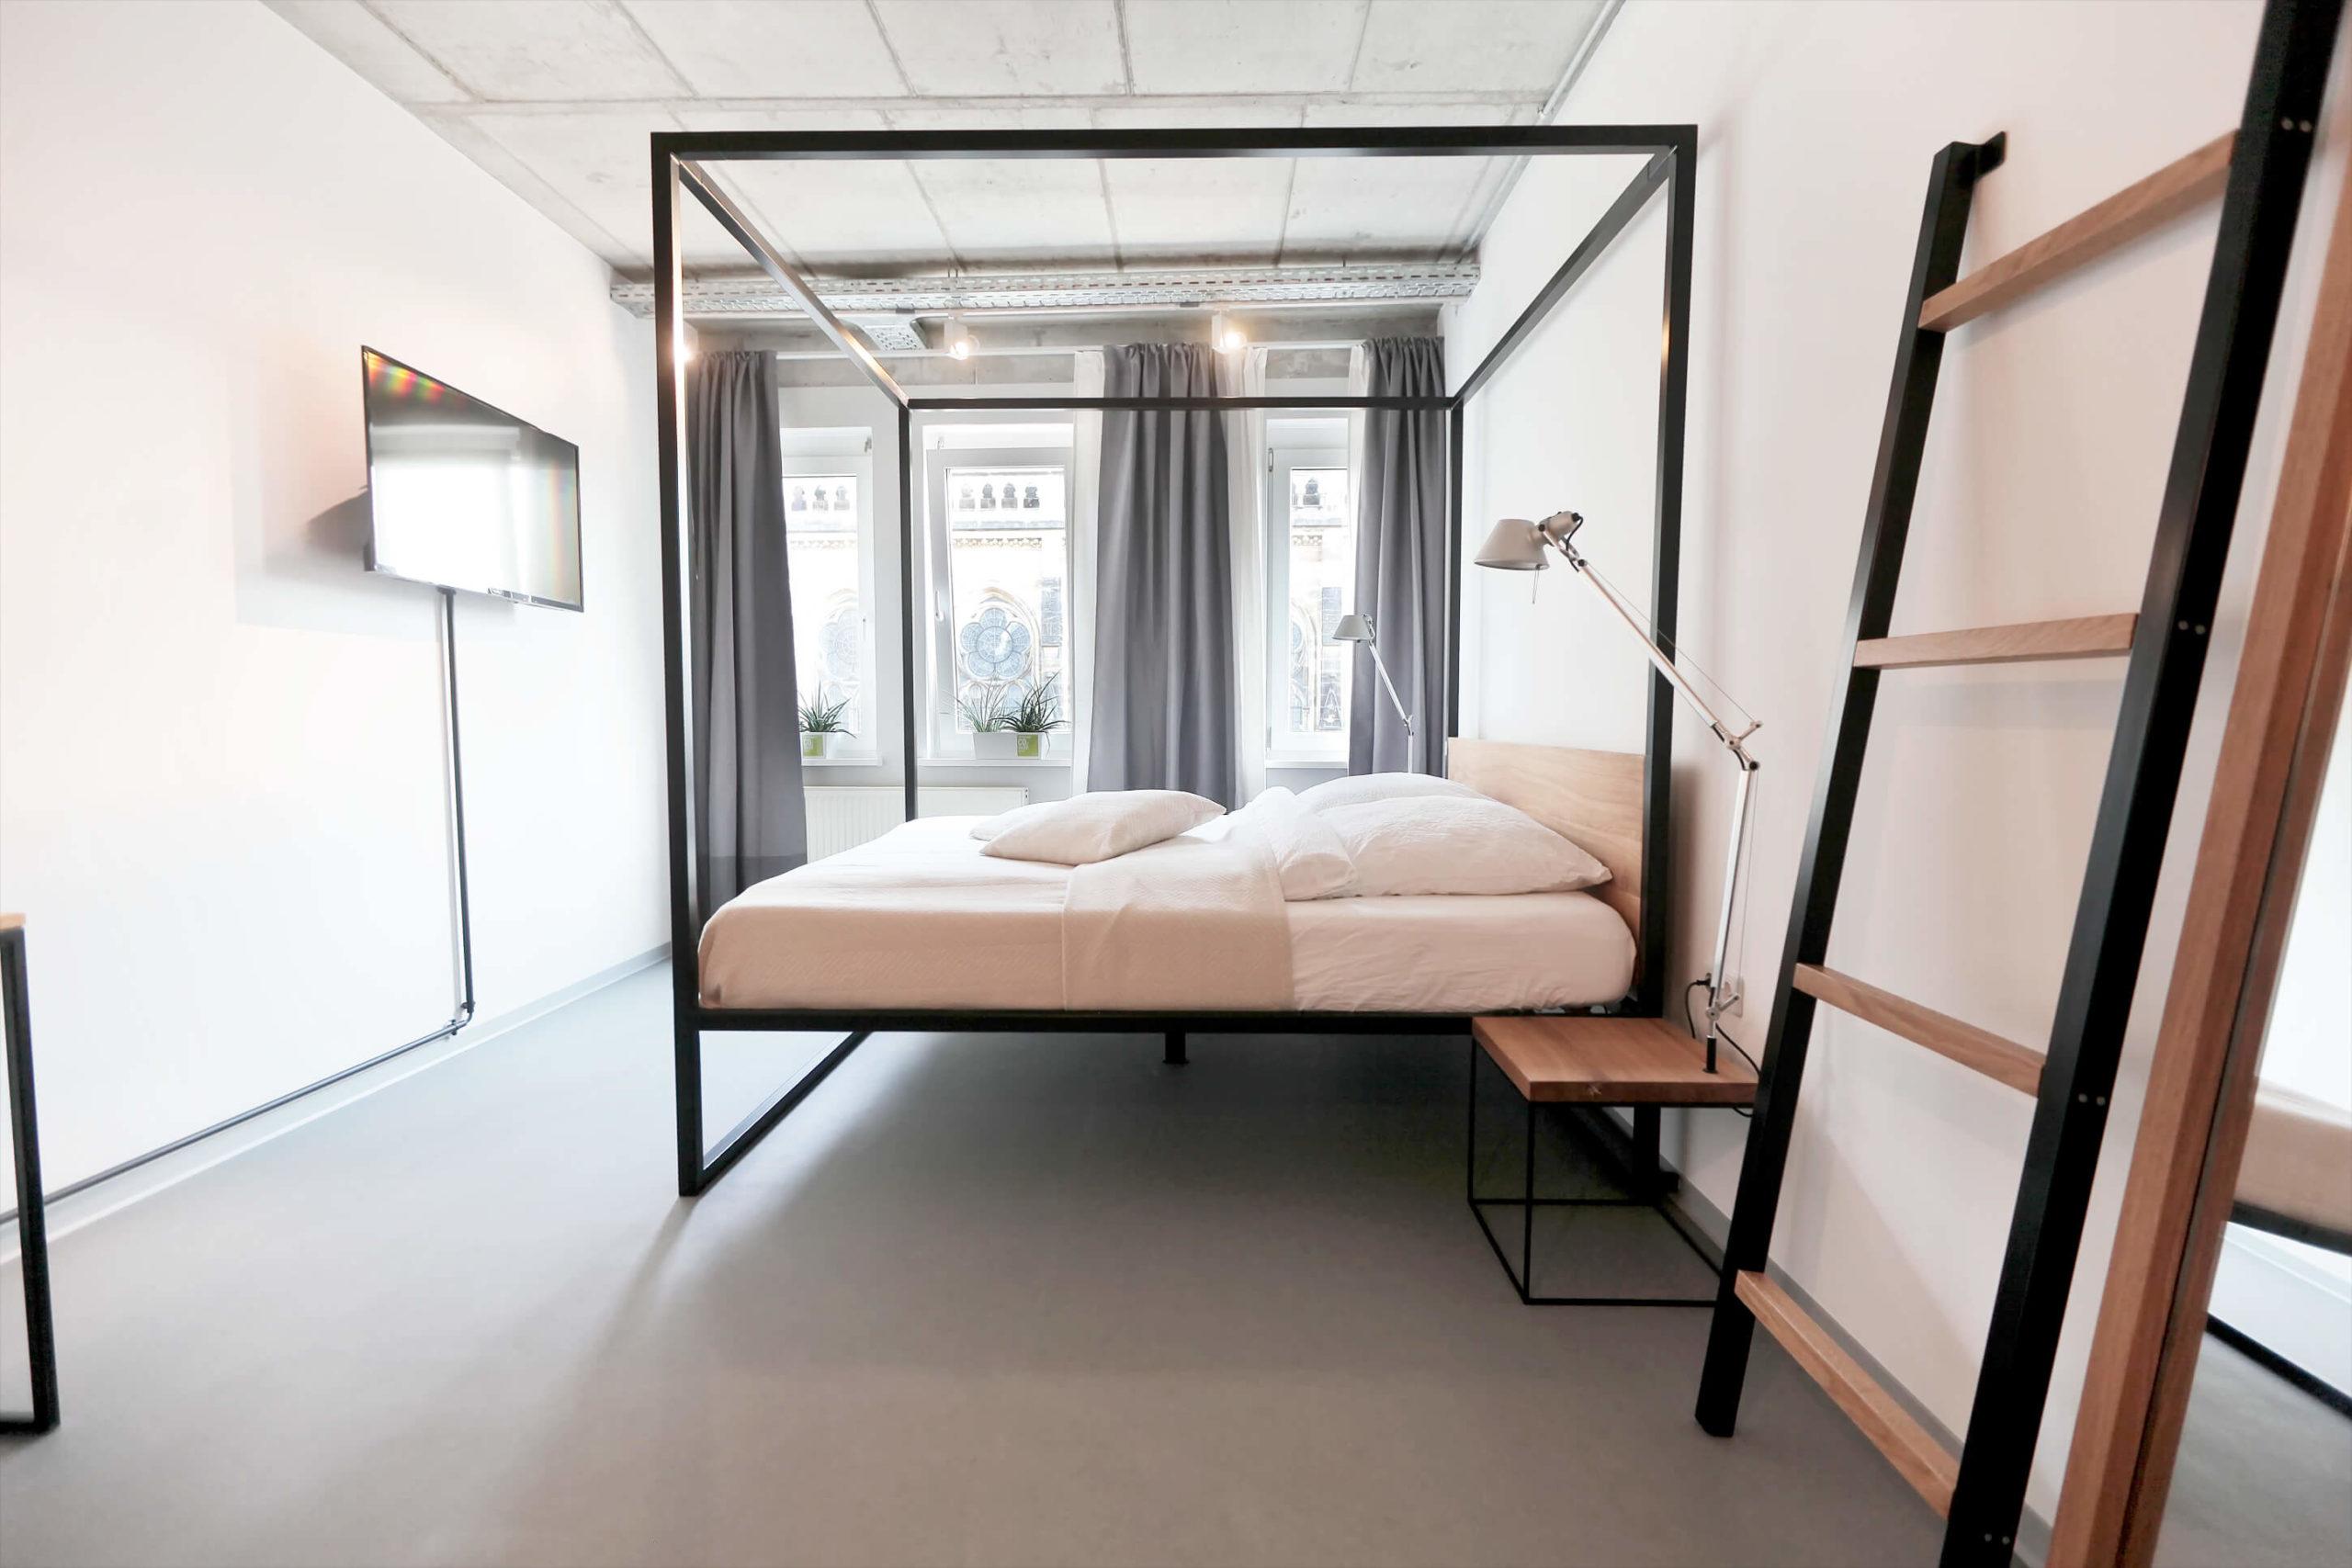 N51E12 Massivholzbett aus Massivholz Eiche und Stahl, Himmelbett im Loft, Loftbett, Betthimmel aus Stahl